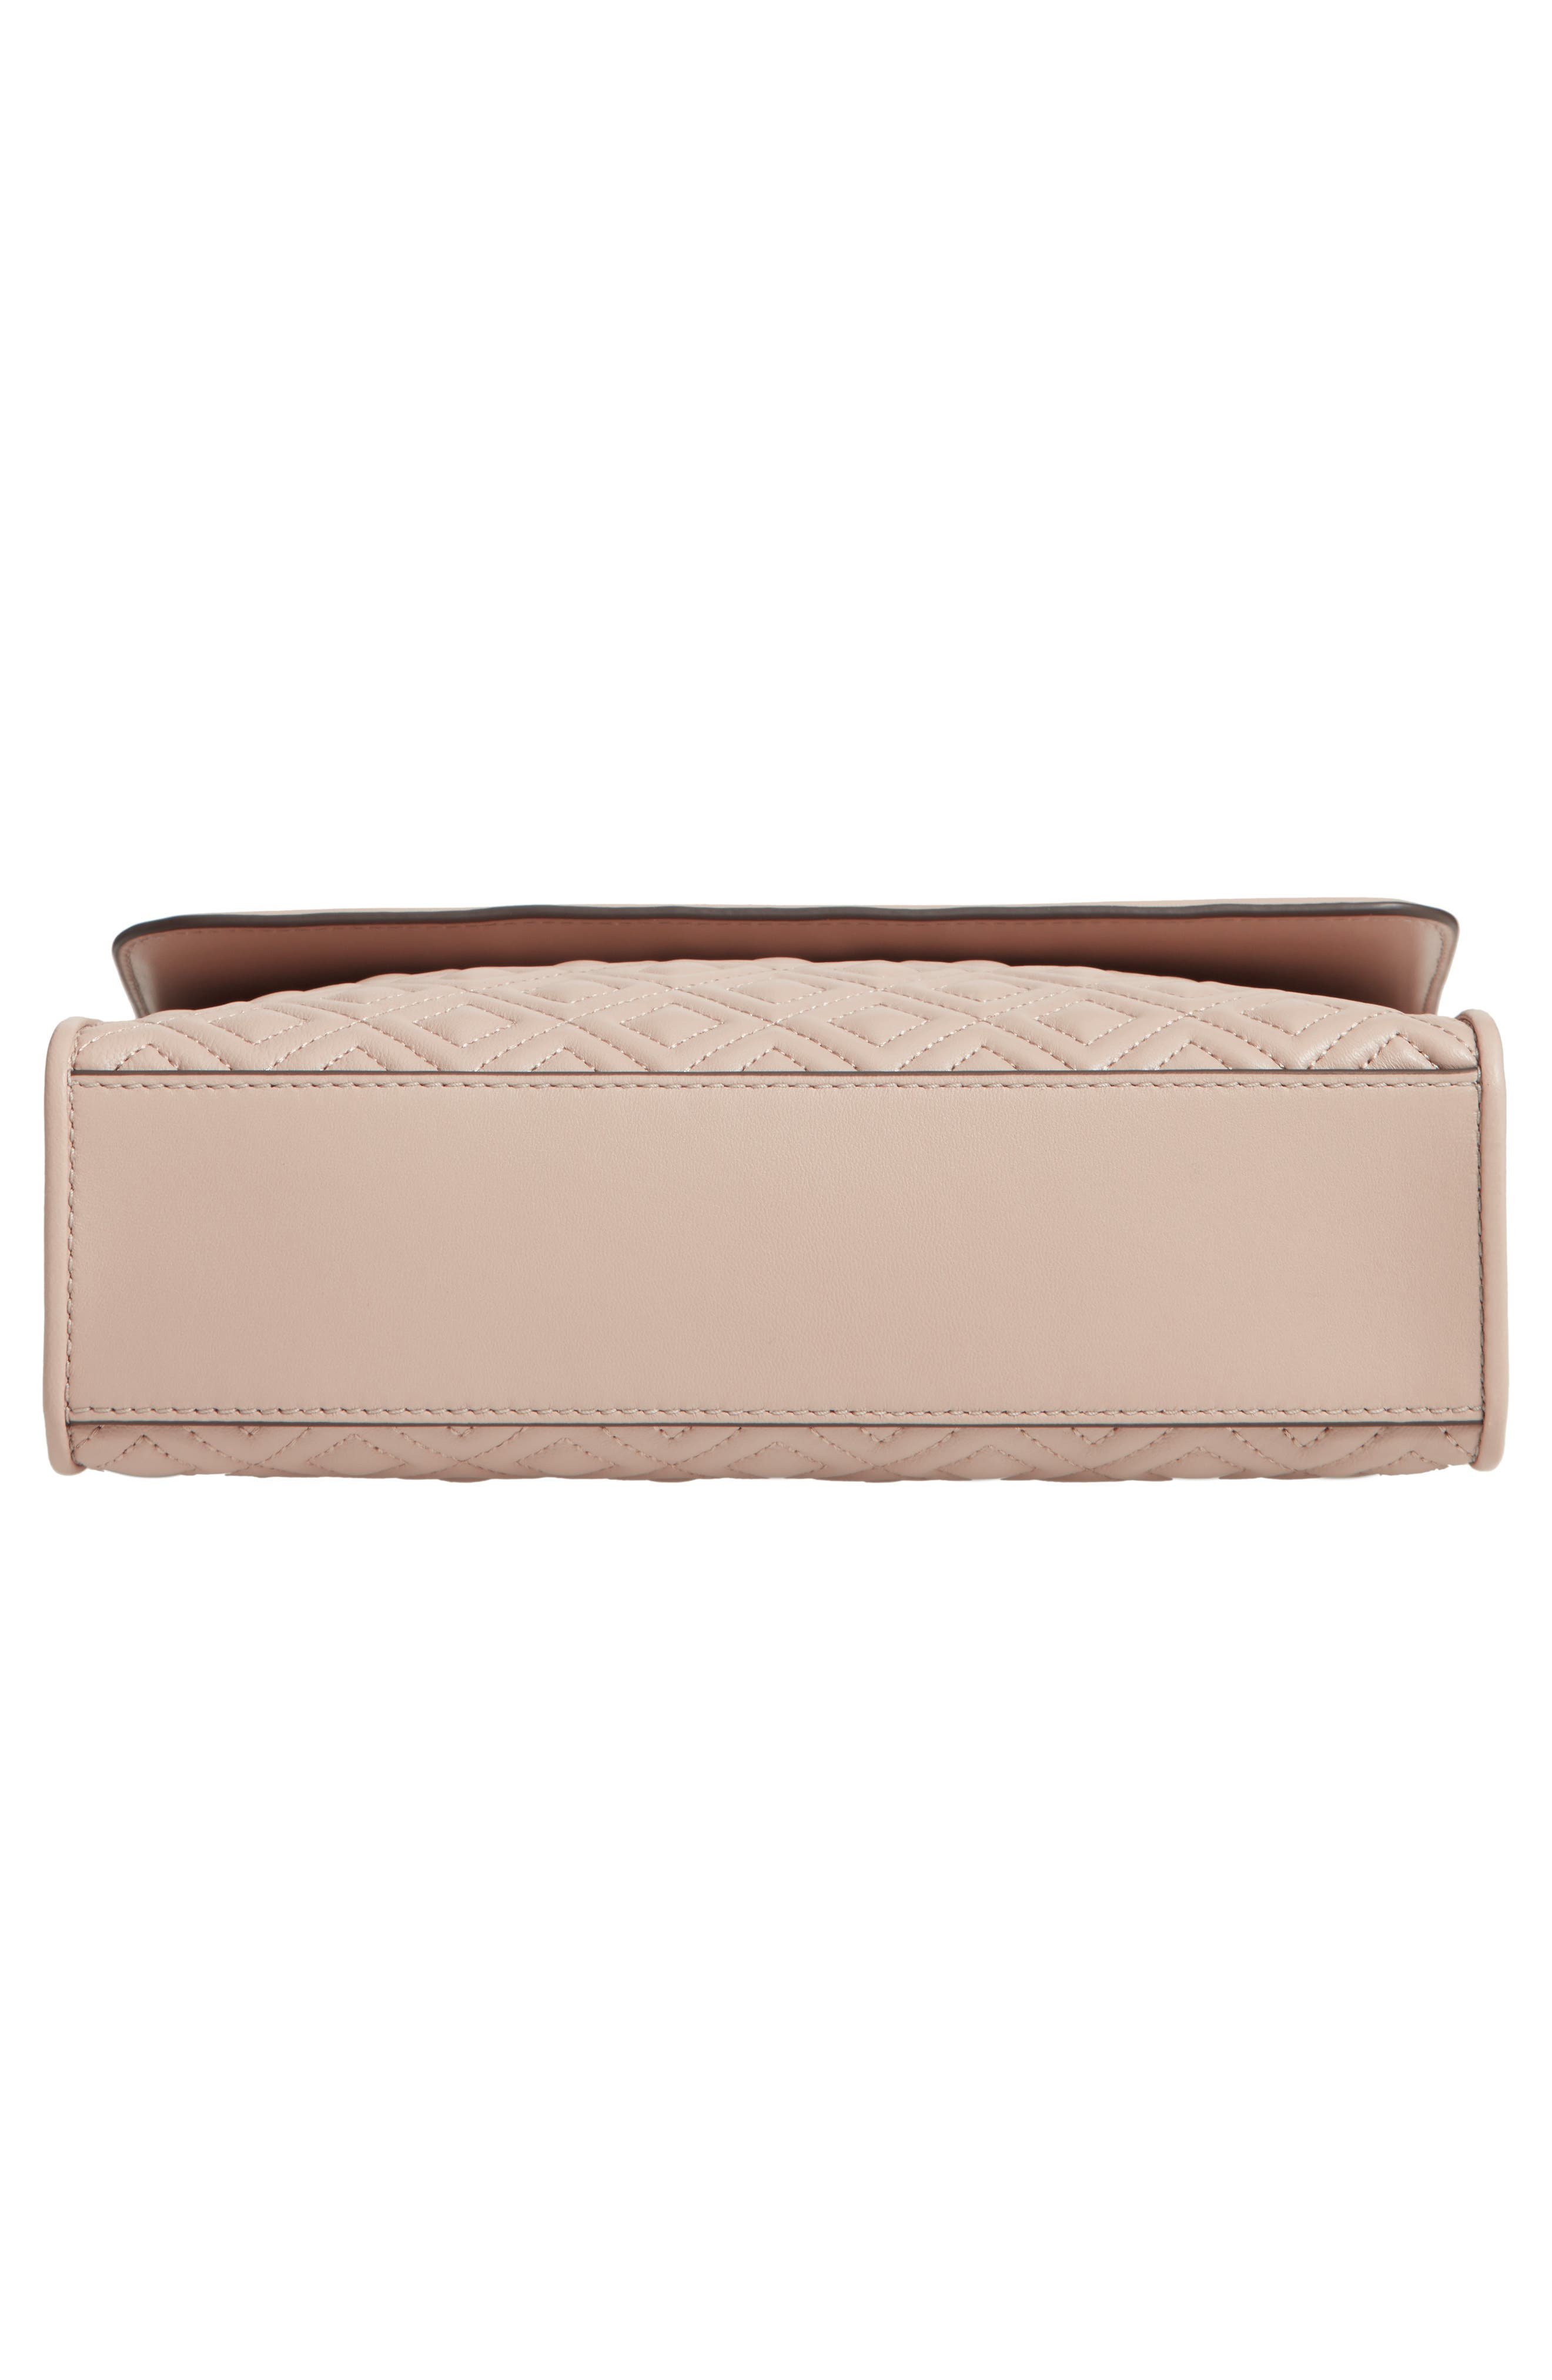 Fleming Leather Convertible Shoulder Bag,                             Alternate thumbnail 6, color,                             NO_COLOR